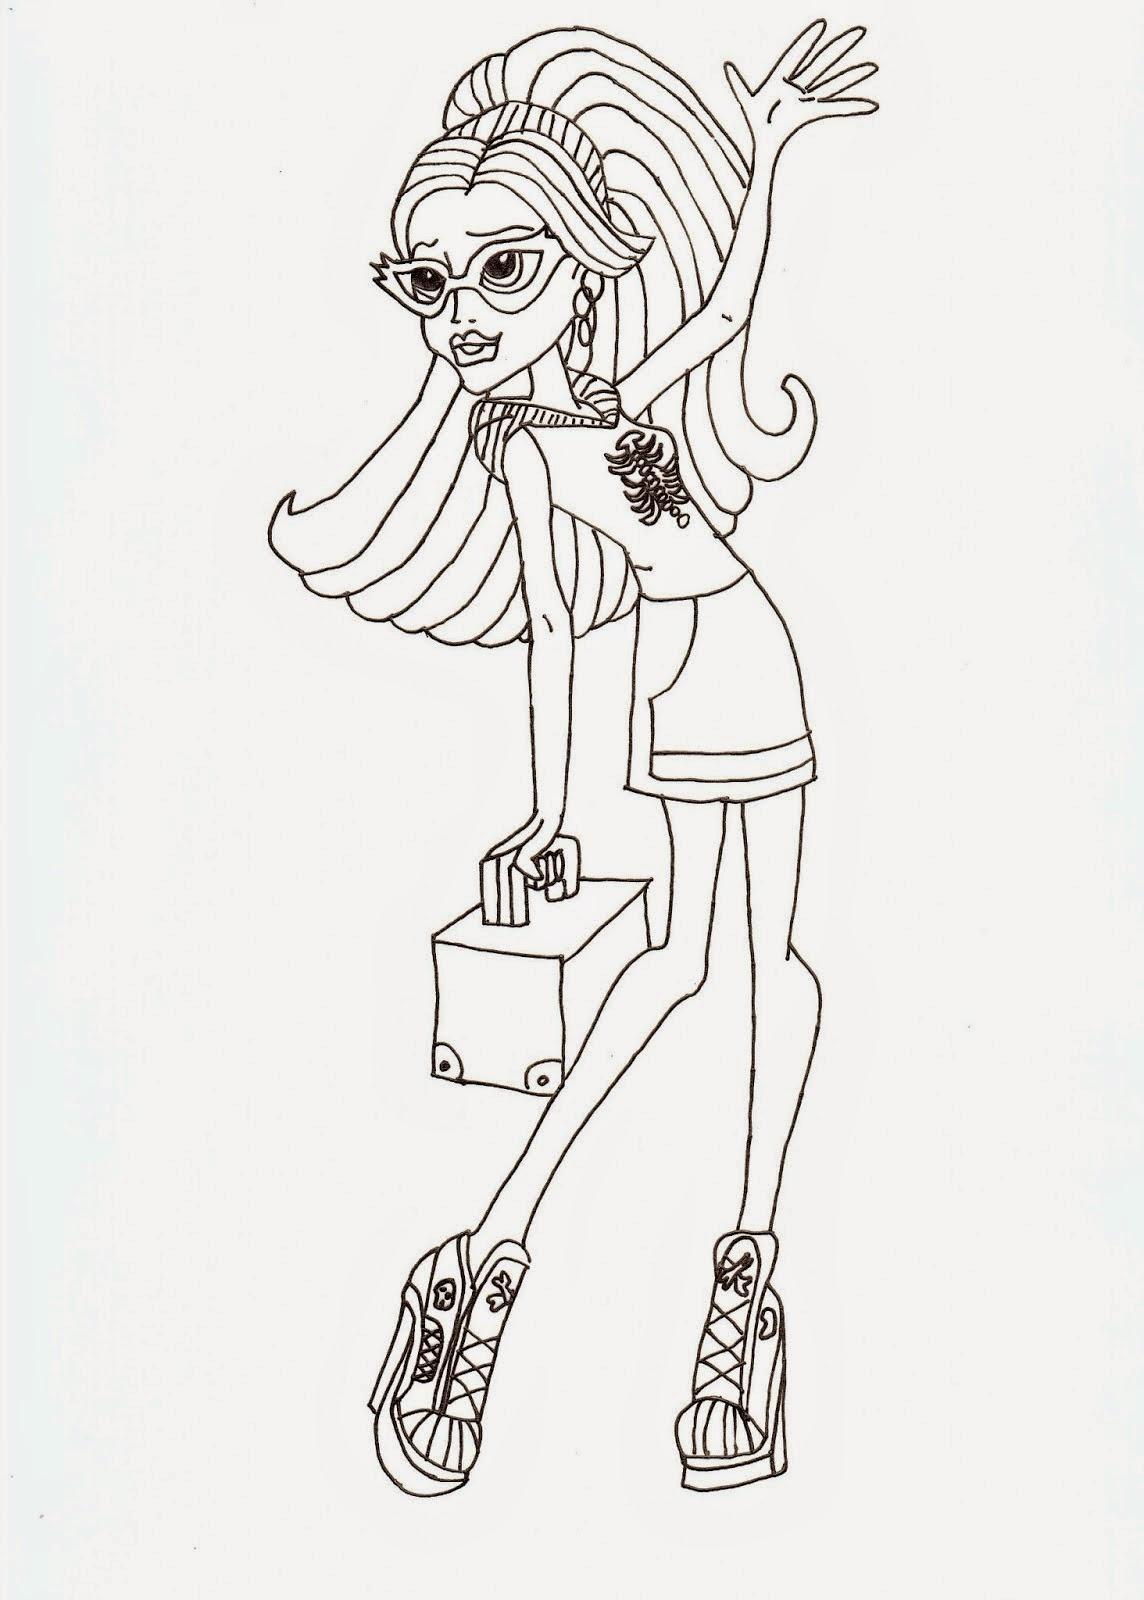 Monster High Fans 1: 6 Dibujos de las Monster High para imprimir y ...